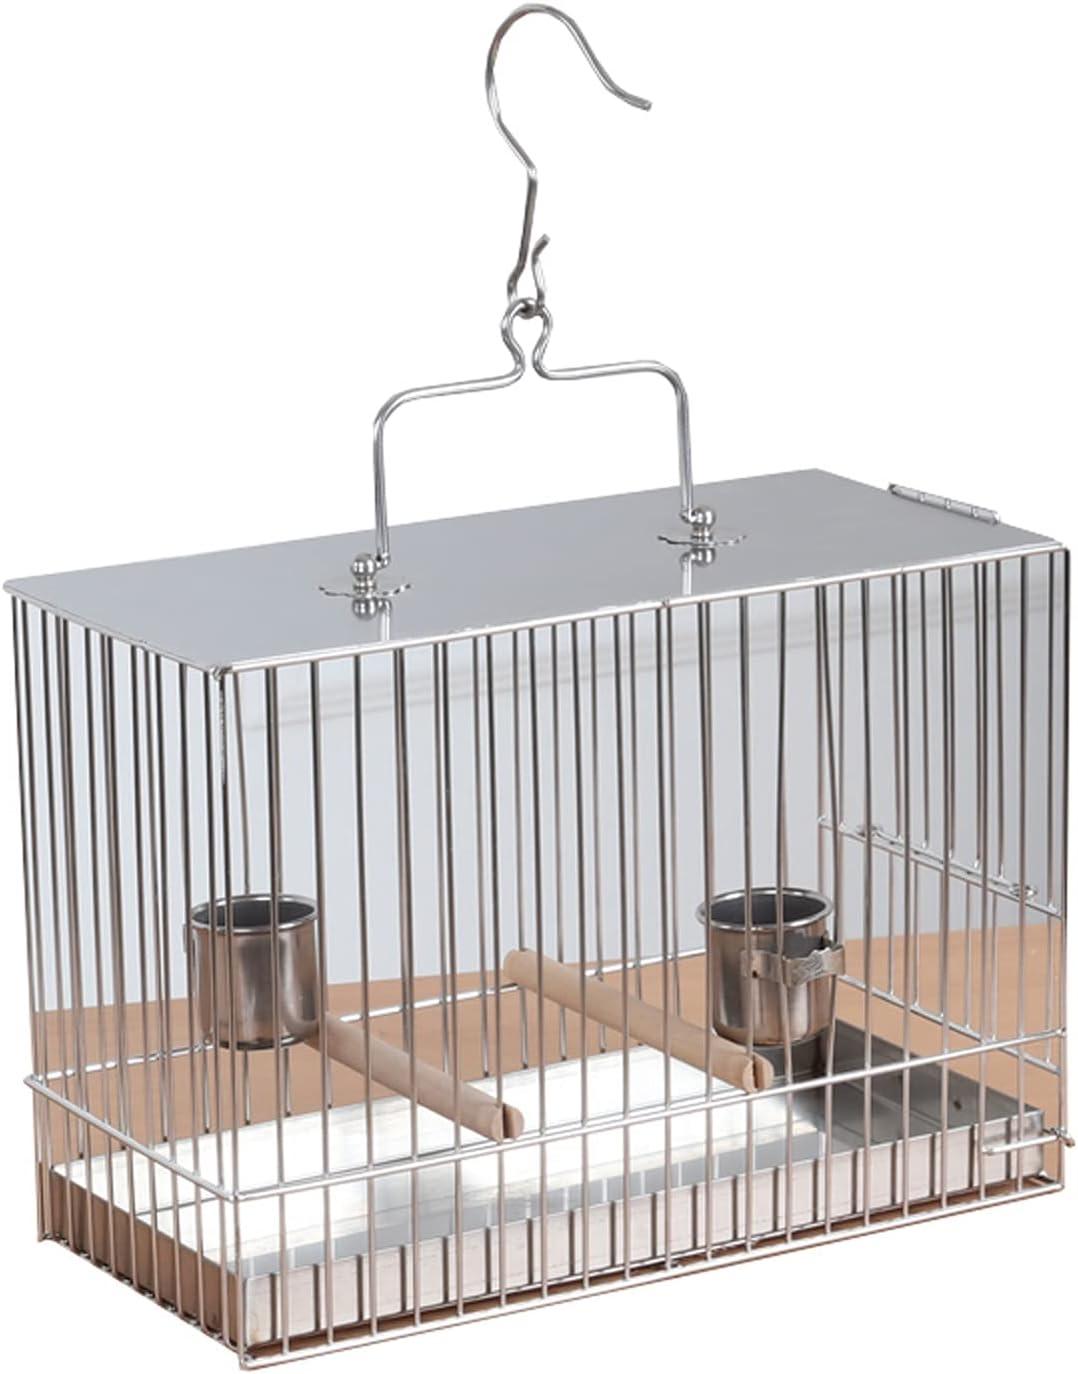 wanhaishop Bird Perches Portable Carrier Li Steel Stainless Max 56% OFF Oakland Mall